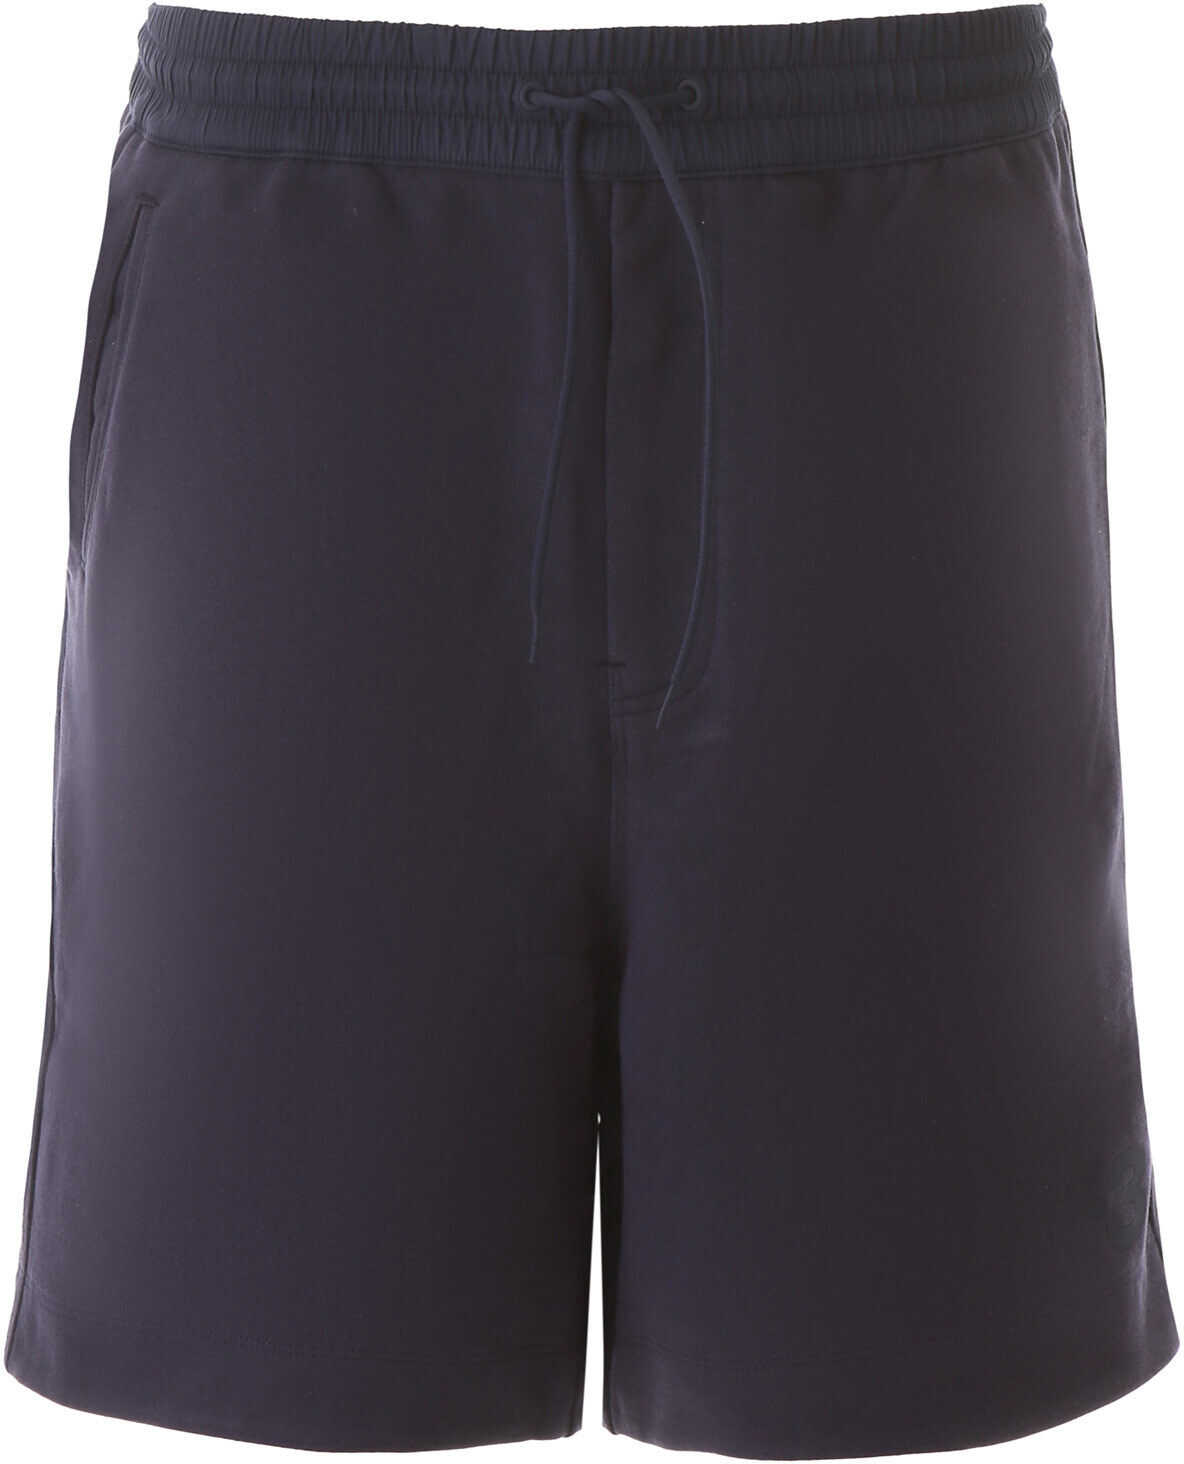 Y-3 Short Jogger Pants With Logo LEGEND INK